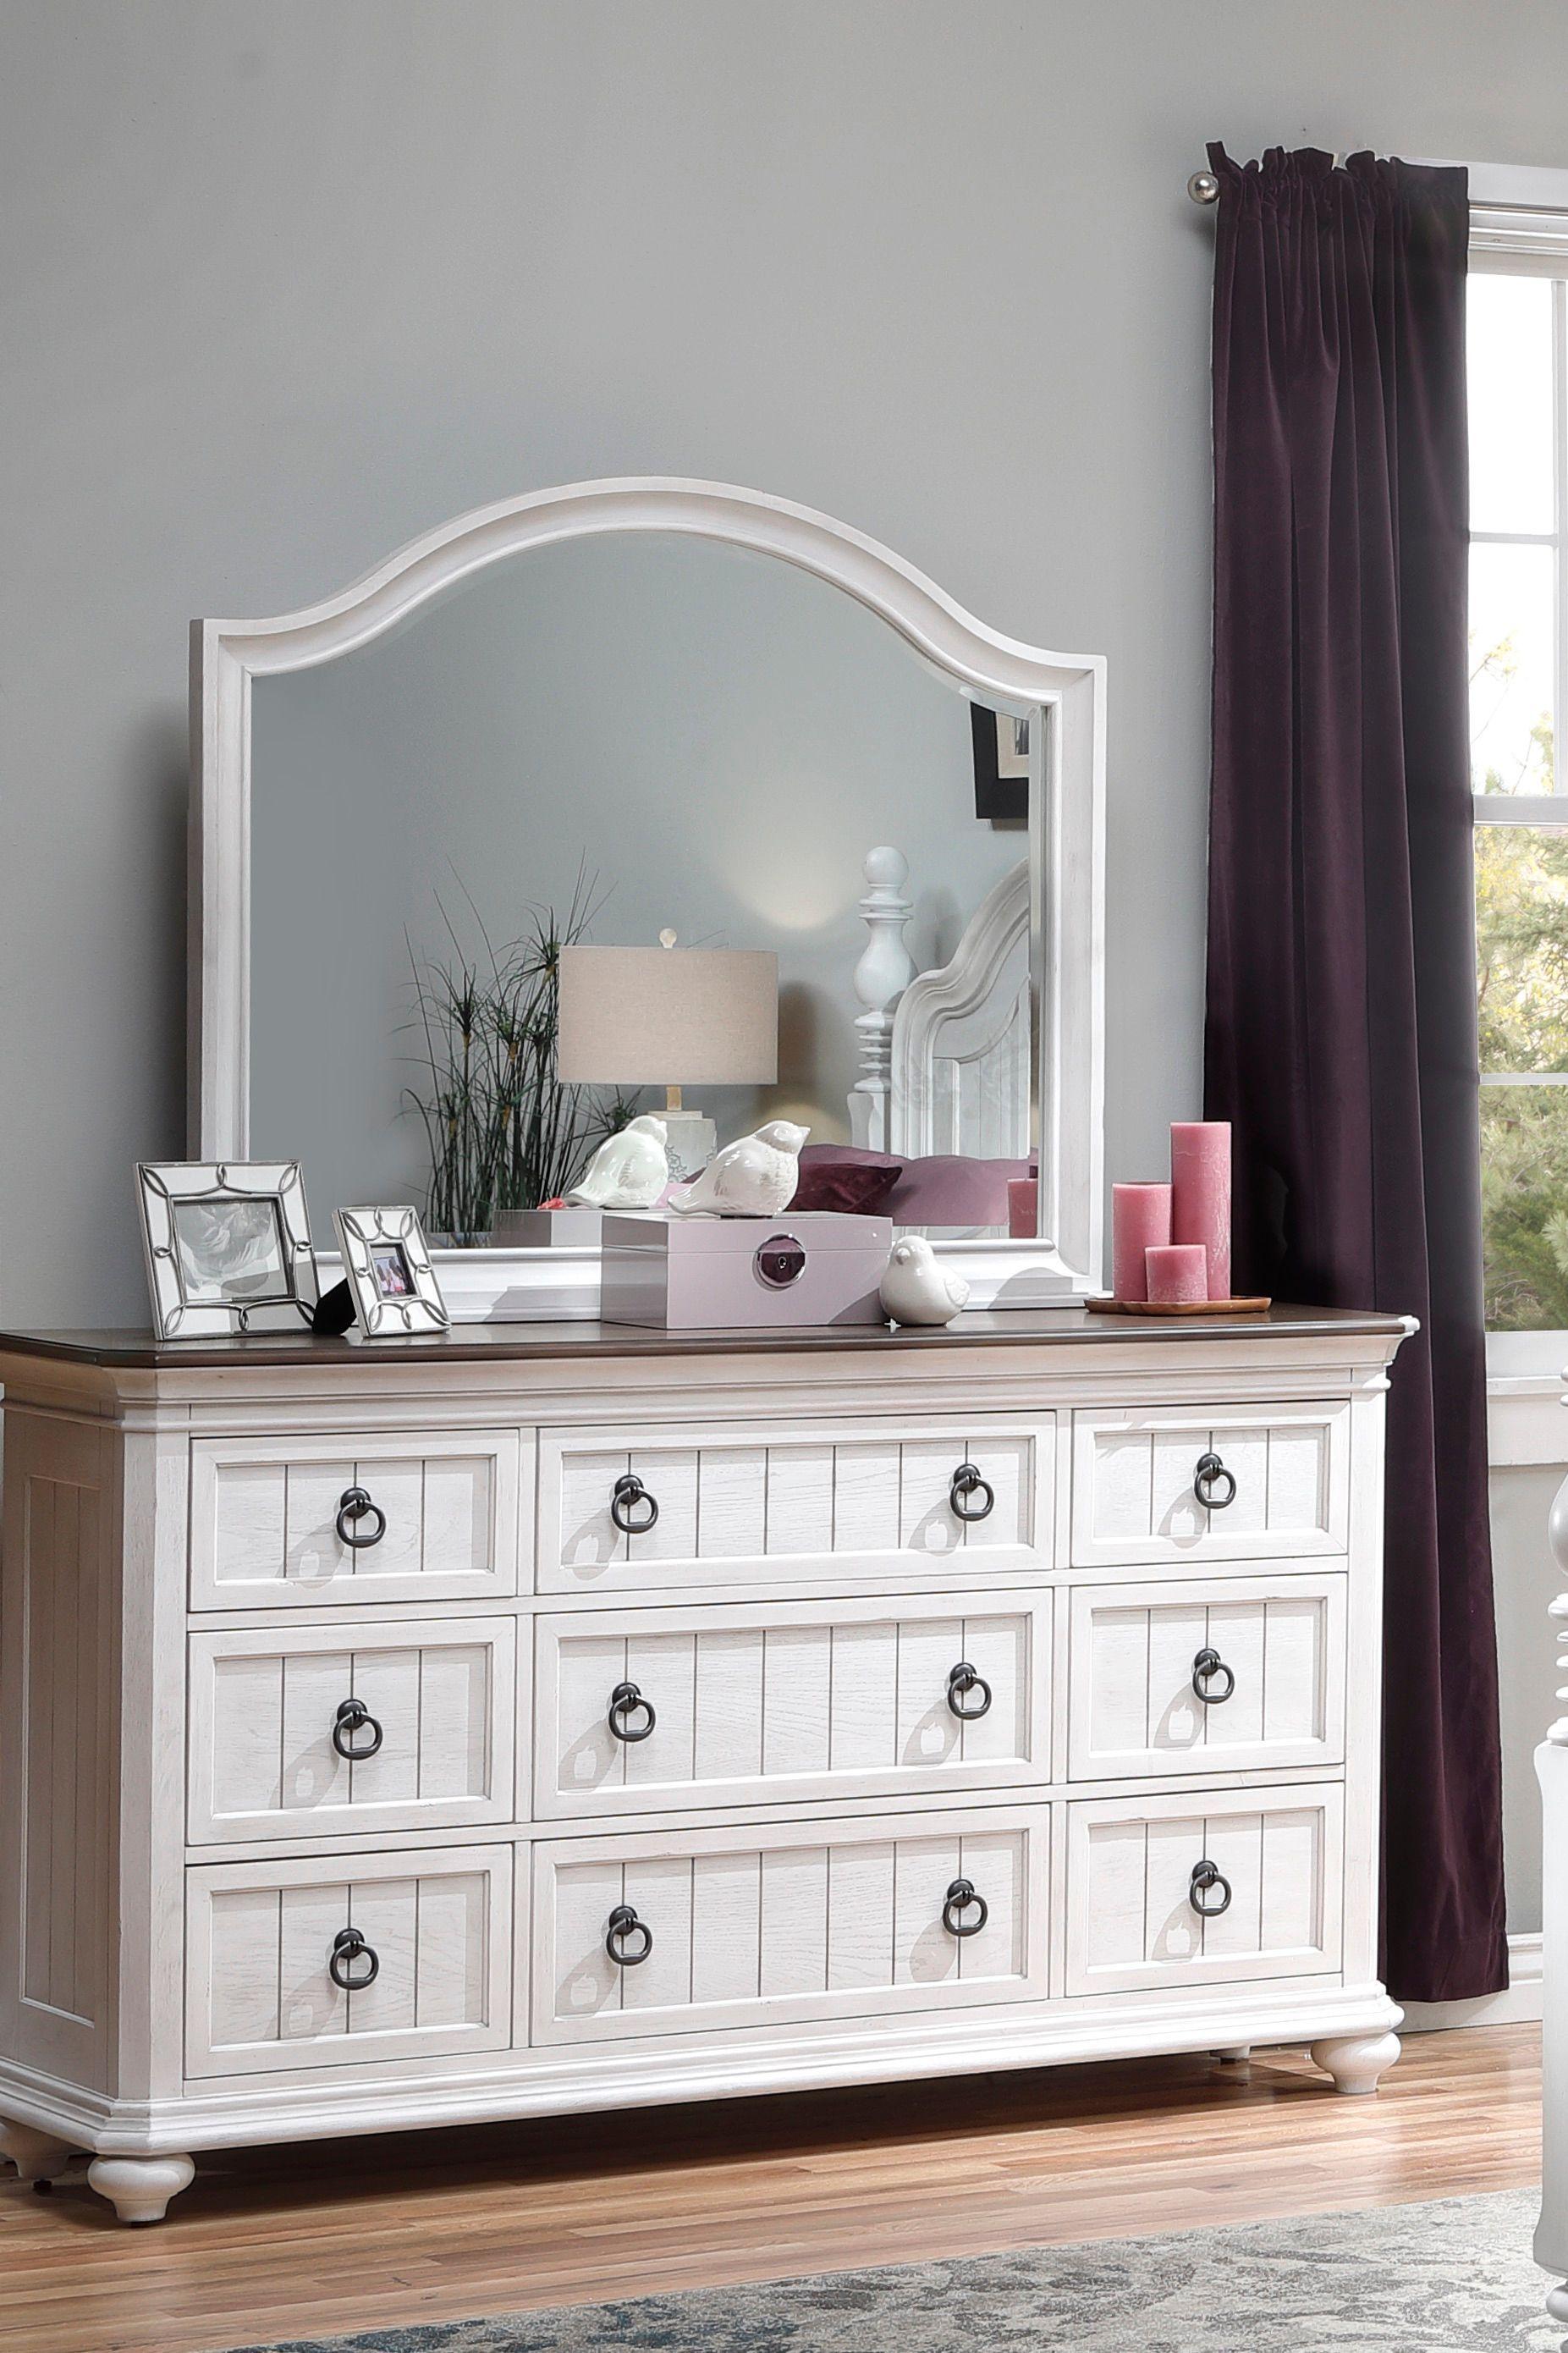 Winston Dresser Furniture Row in 2020 Living room